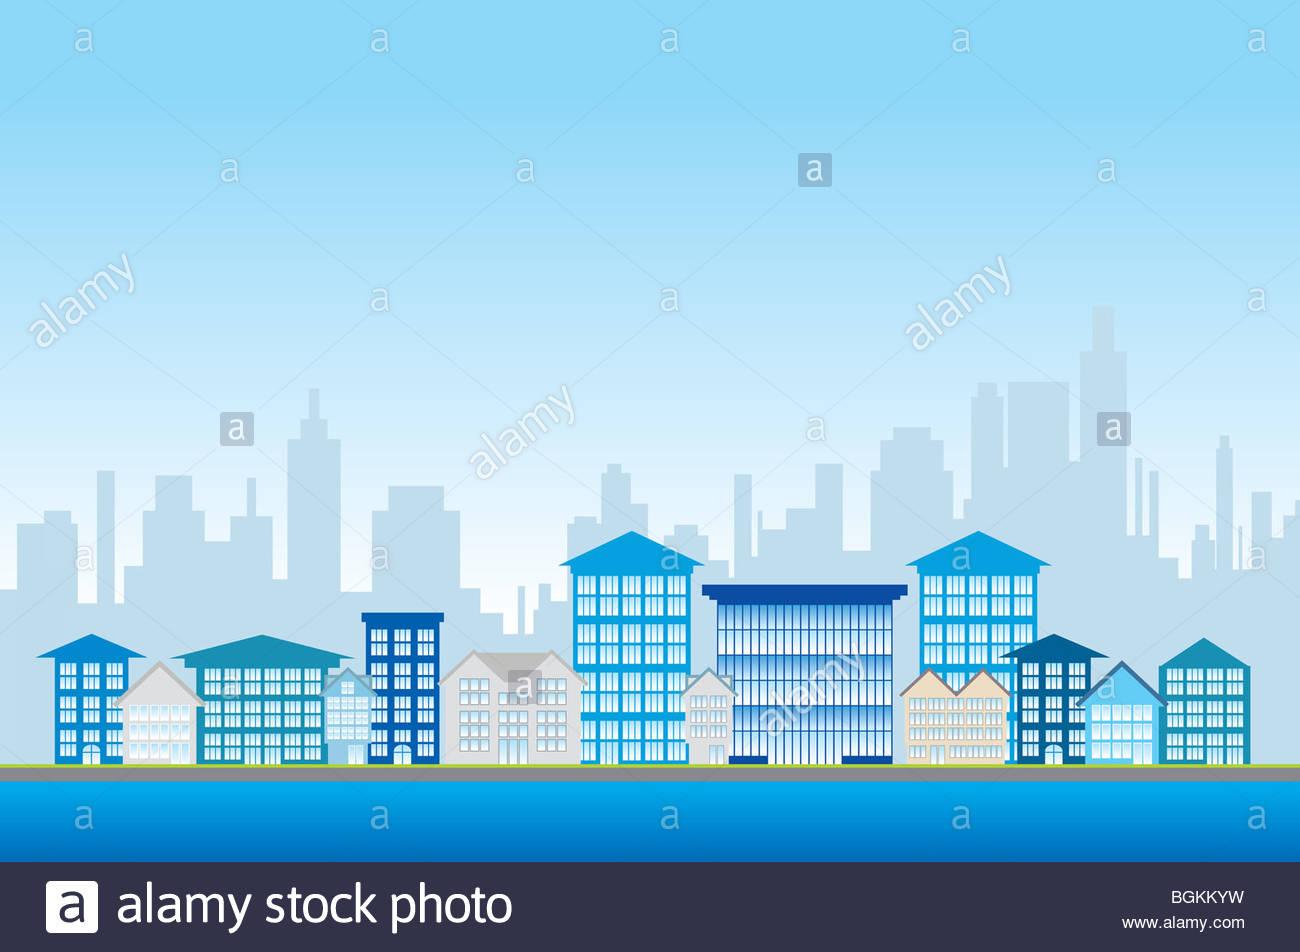 City life illustration - Stock Image